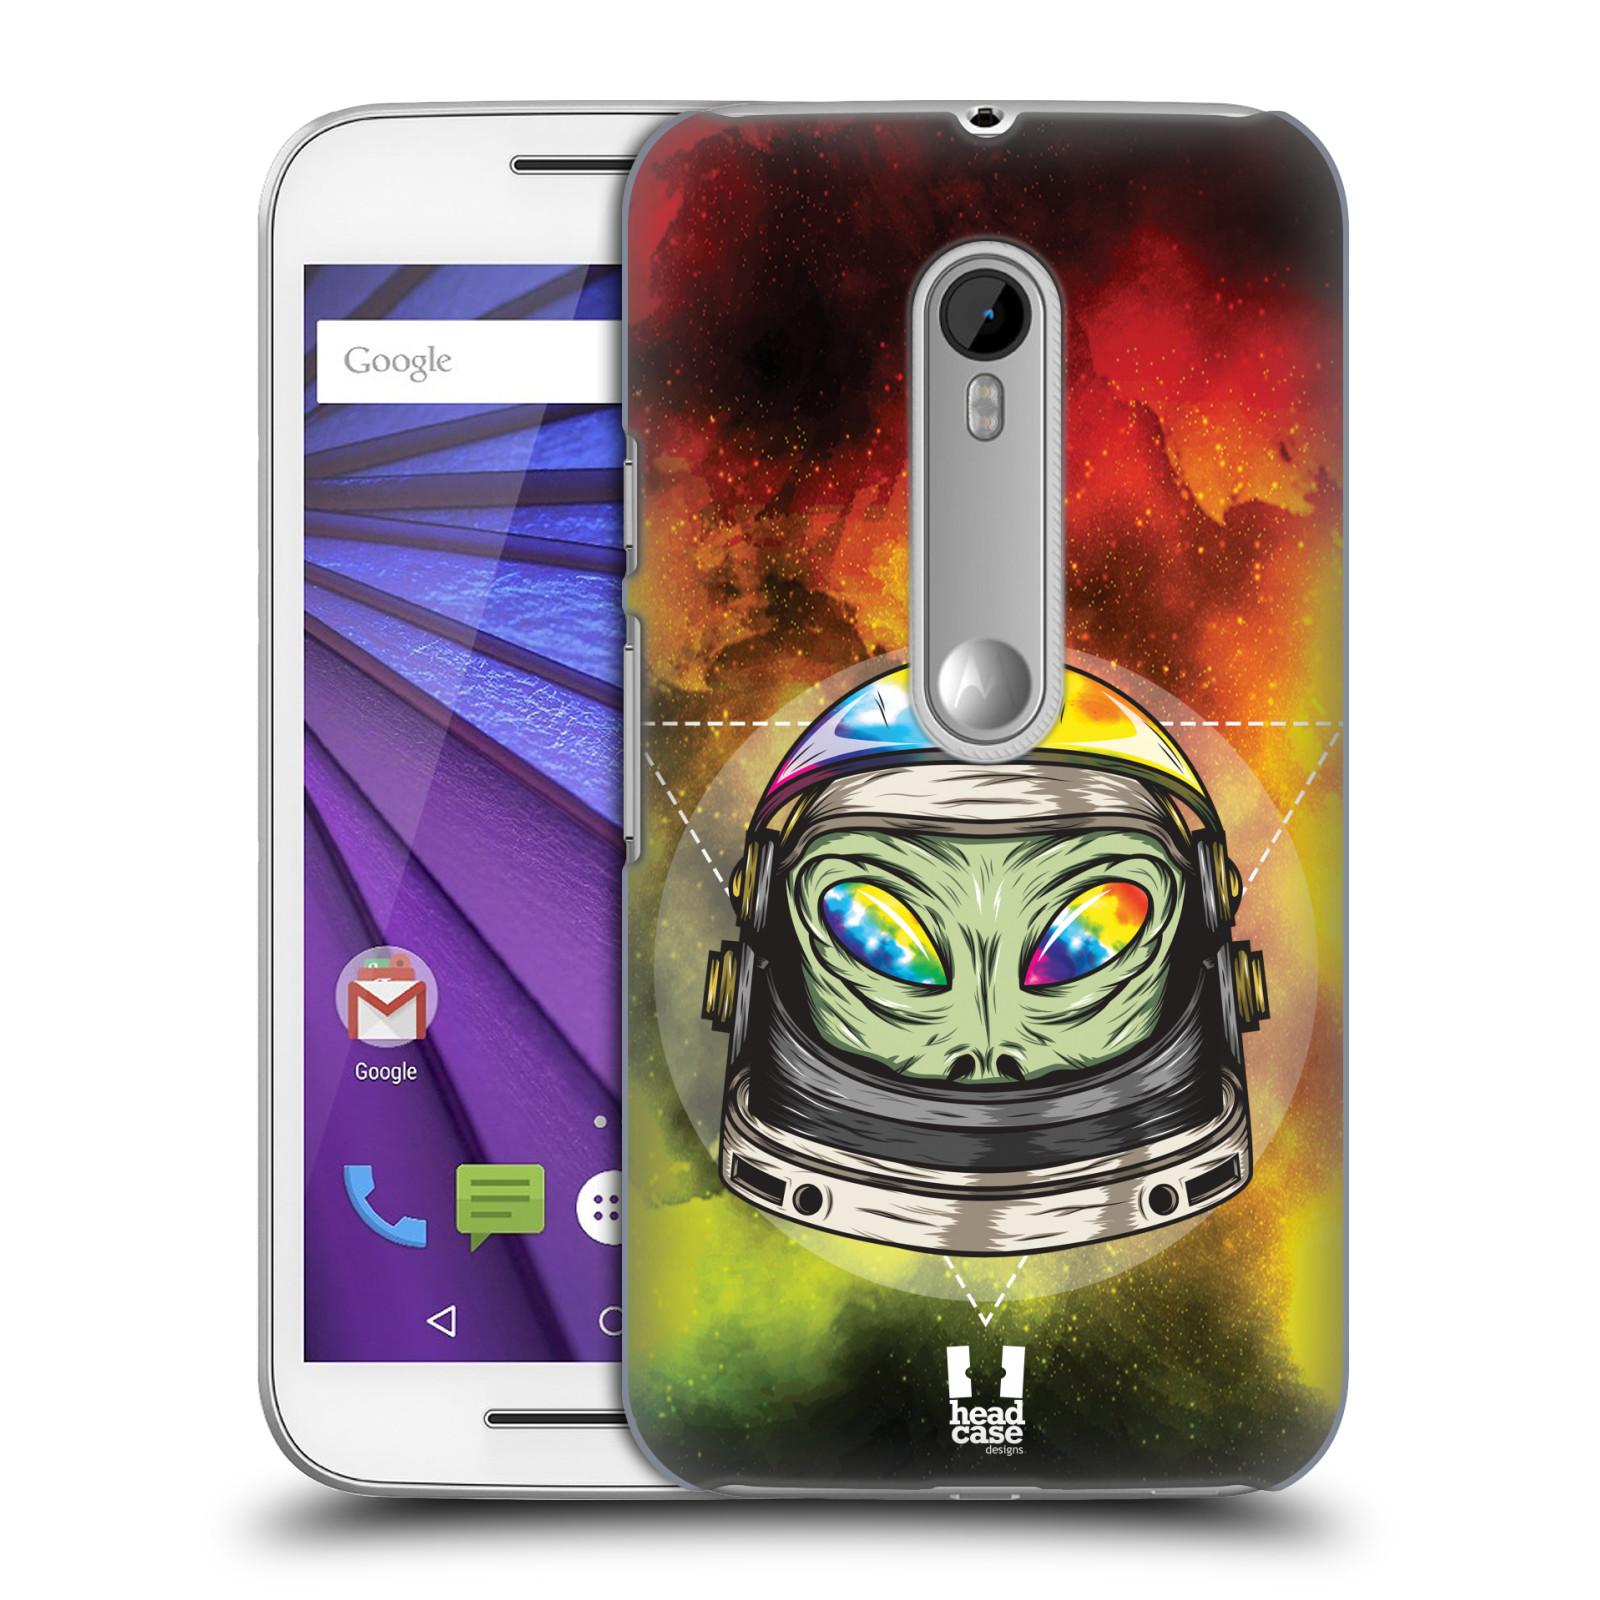 HEAD-CASE-DESIGNS-RAINBOW-ASTRONAUT-HARD-BACK-CASE-FOR-MOTOROLA-PHONES-1